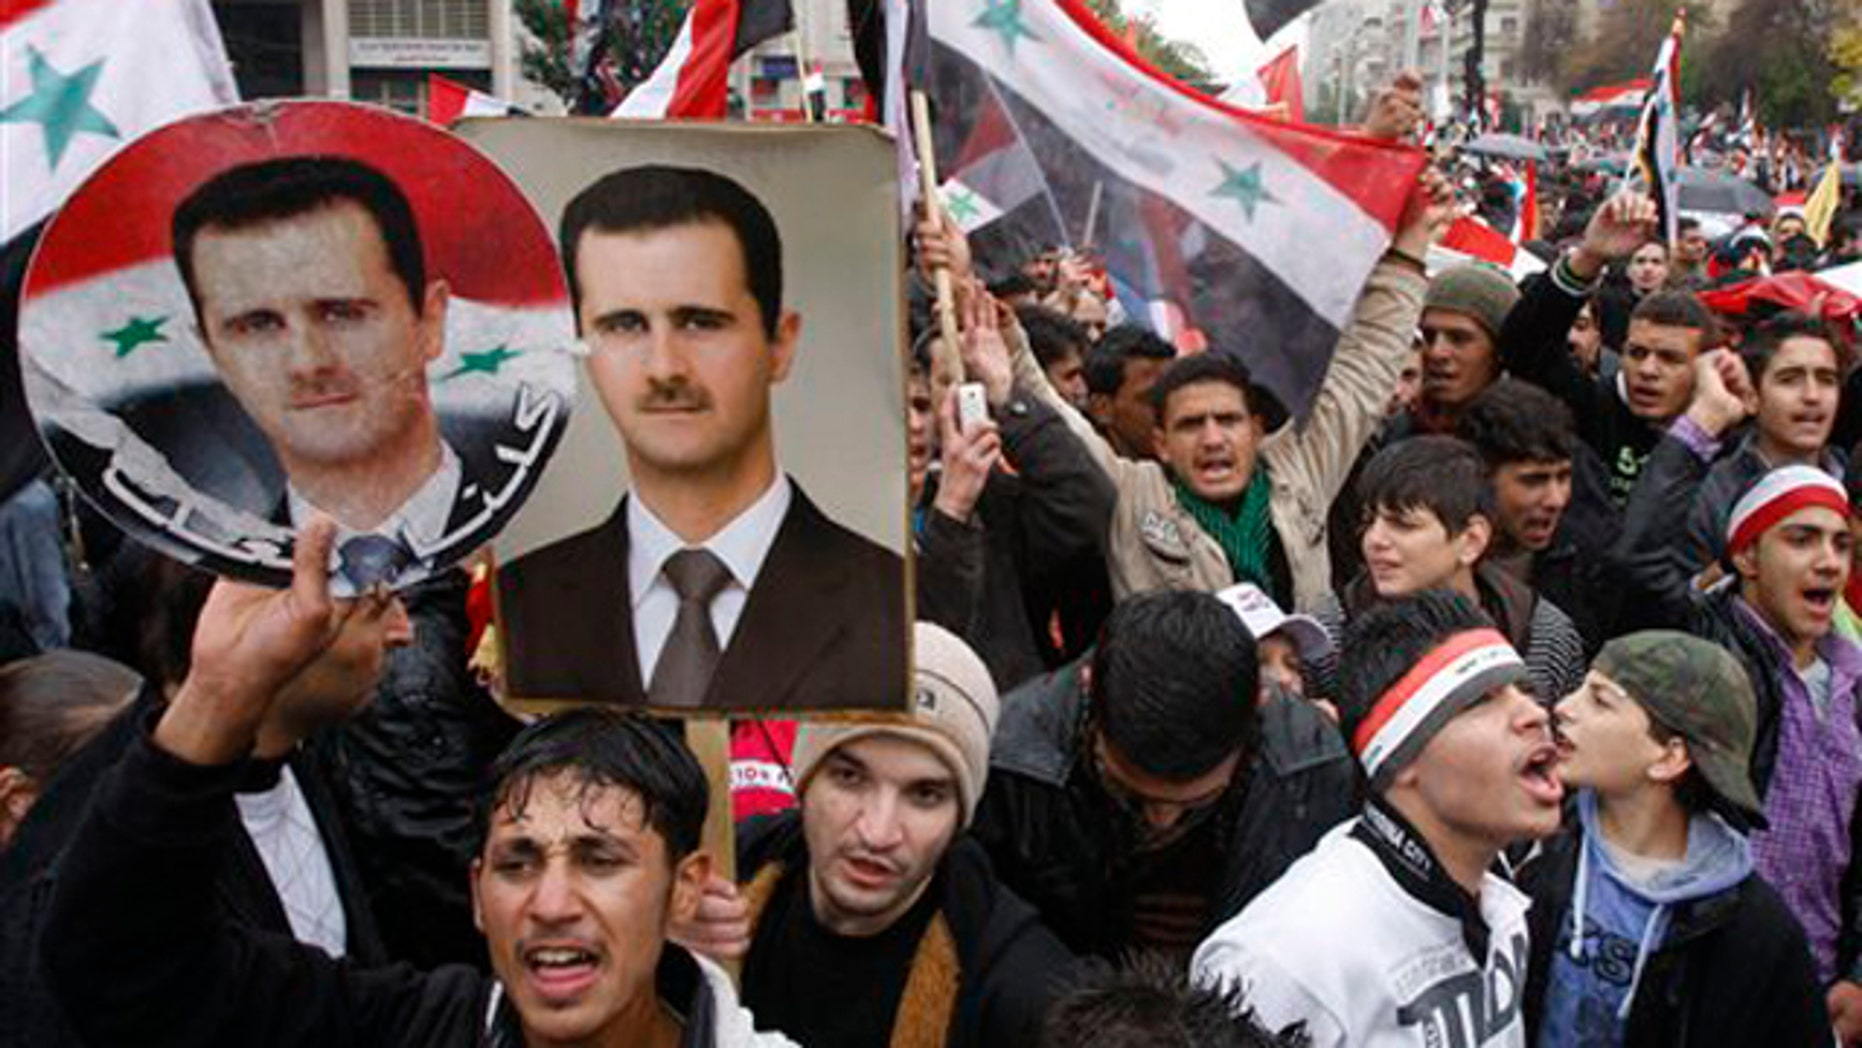 November 16, 2011: Pro-Syrian regime protesters, shout pro-Syrian President Bashar Assad slogans during a demonstration in Damascus, Syria.